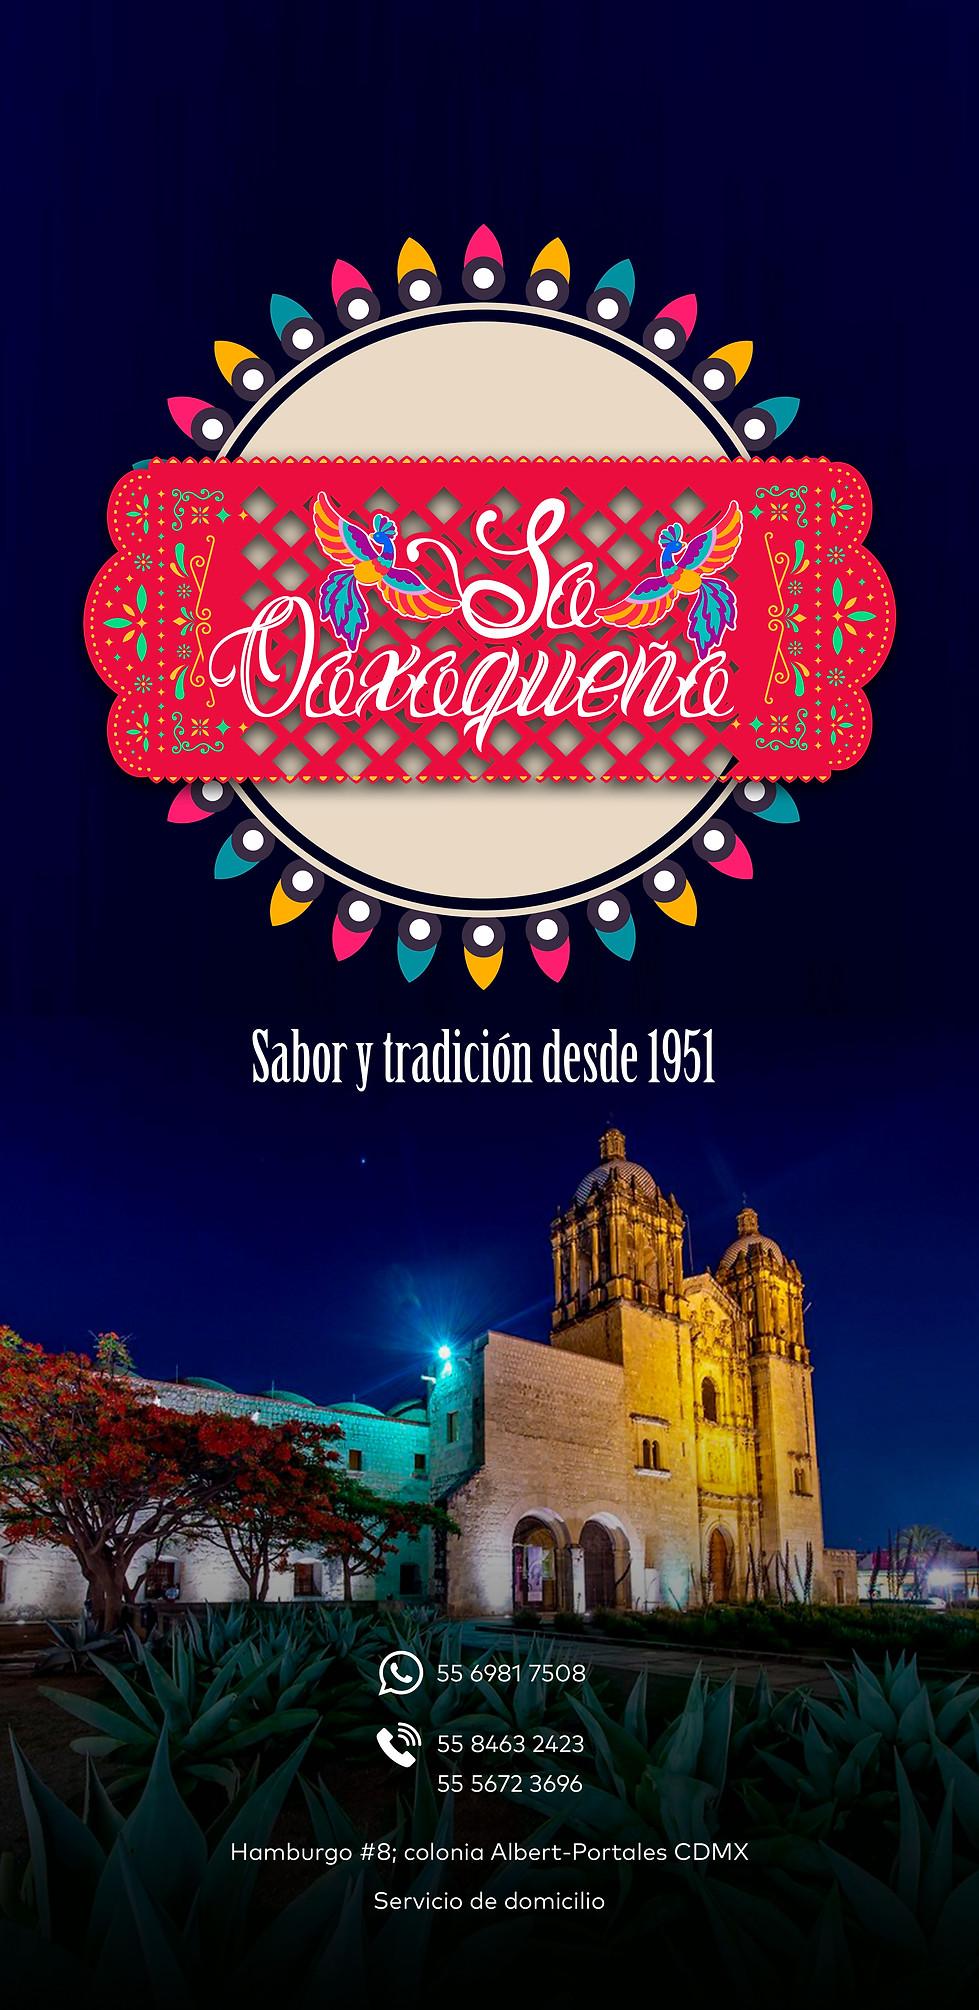 La-Oaxaquena-01.jpg